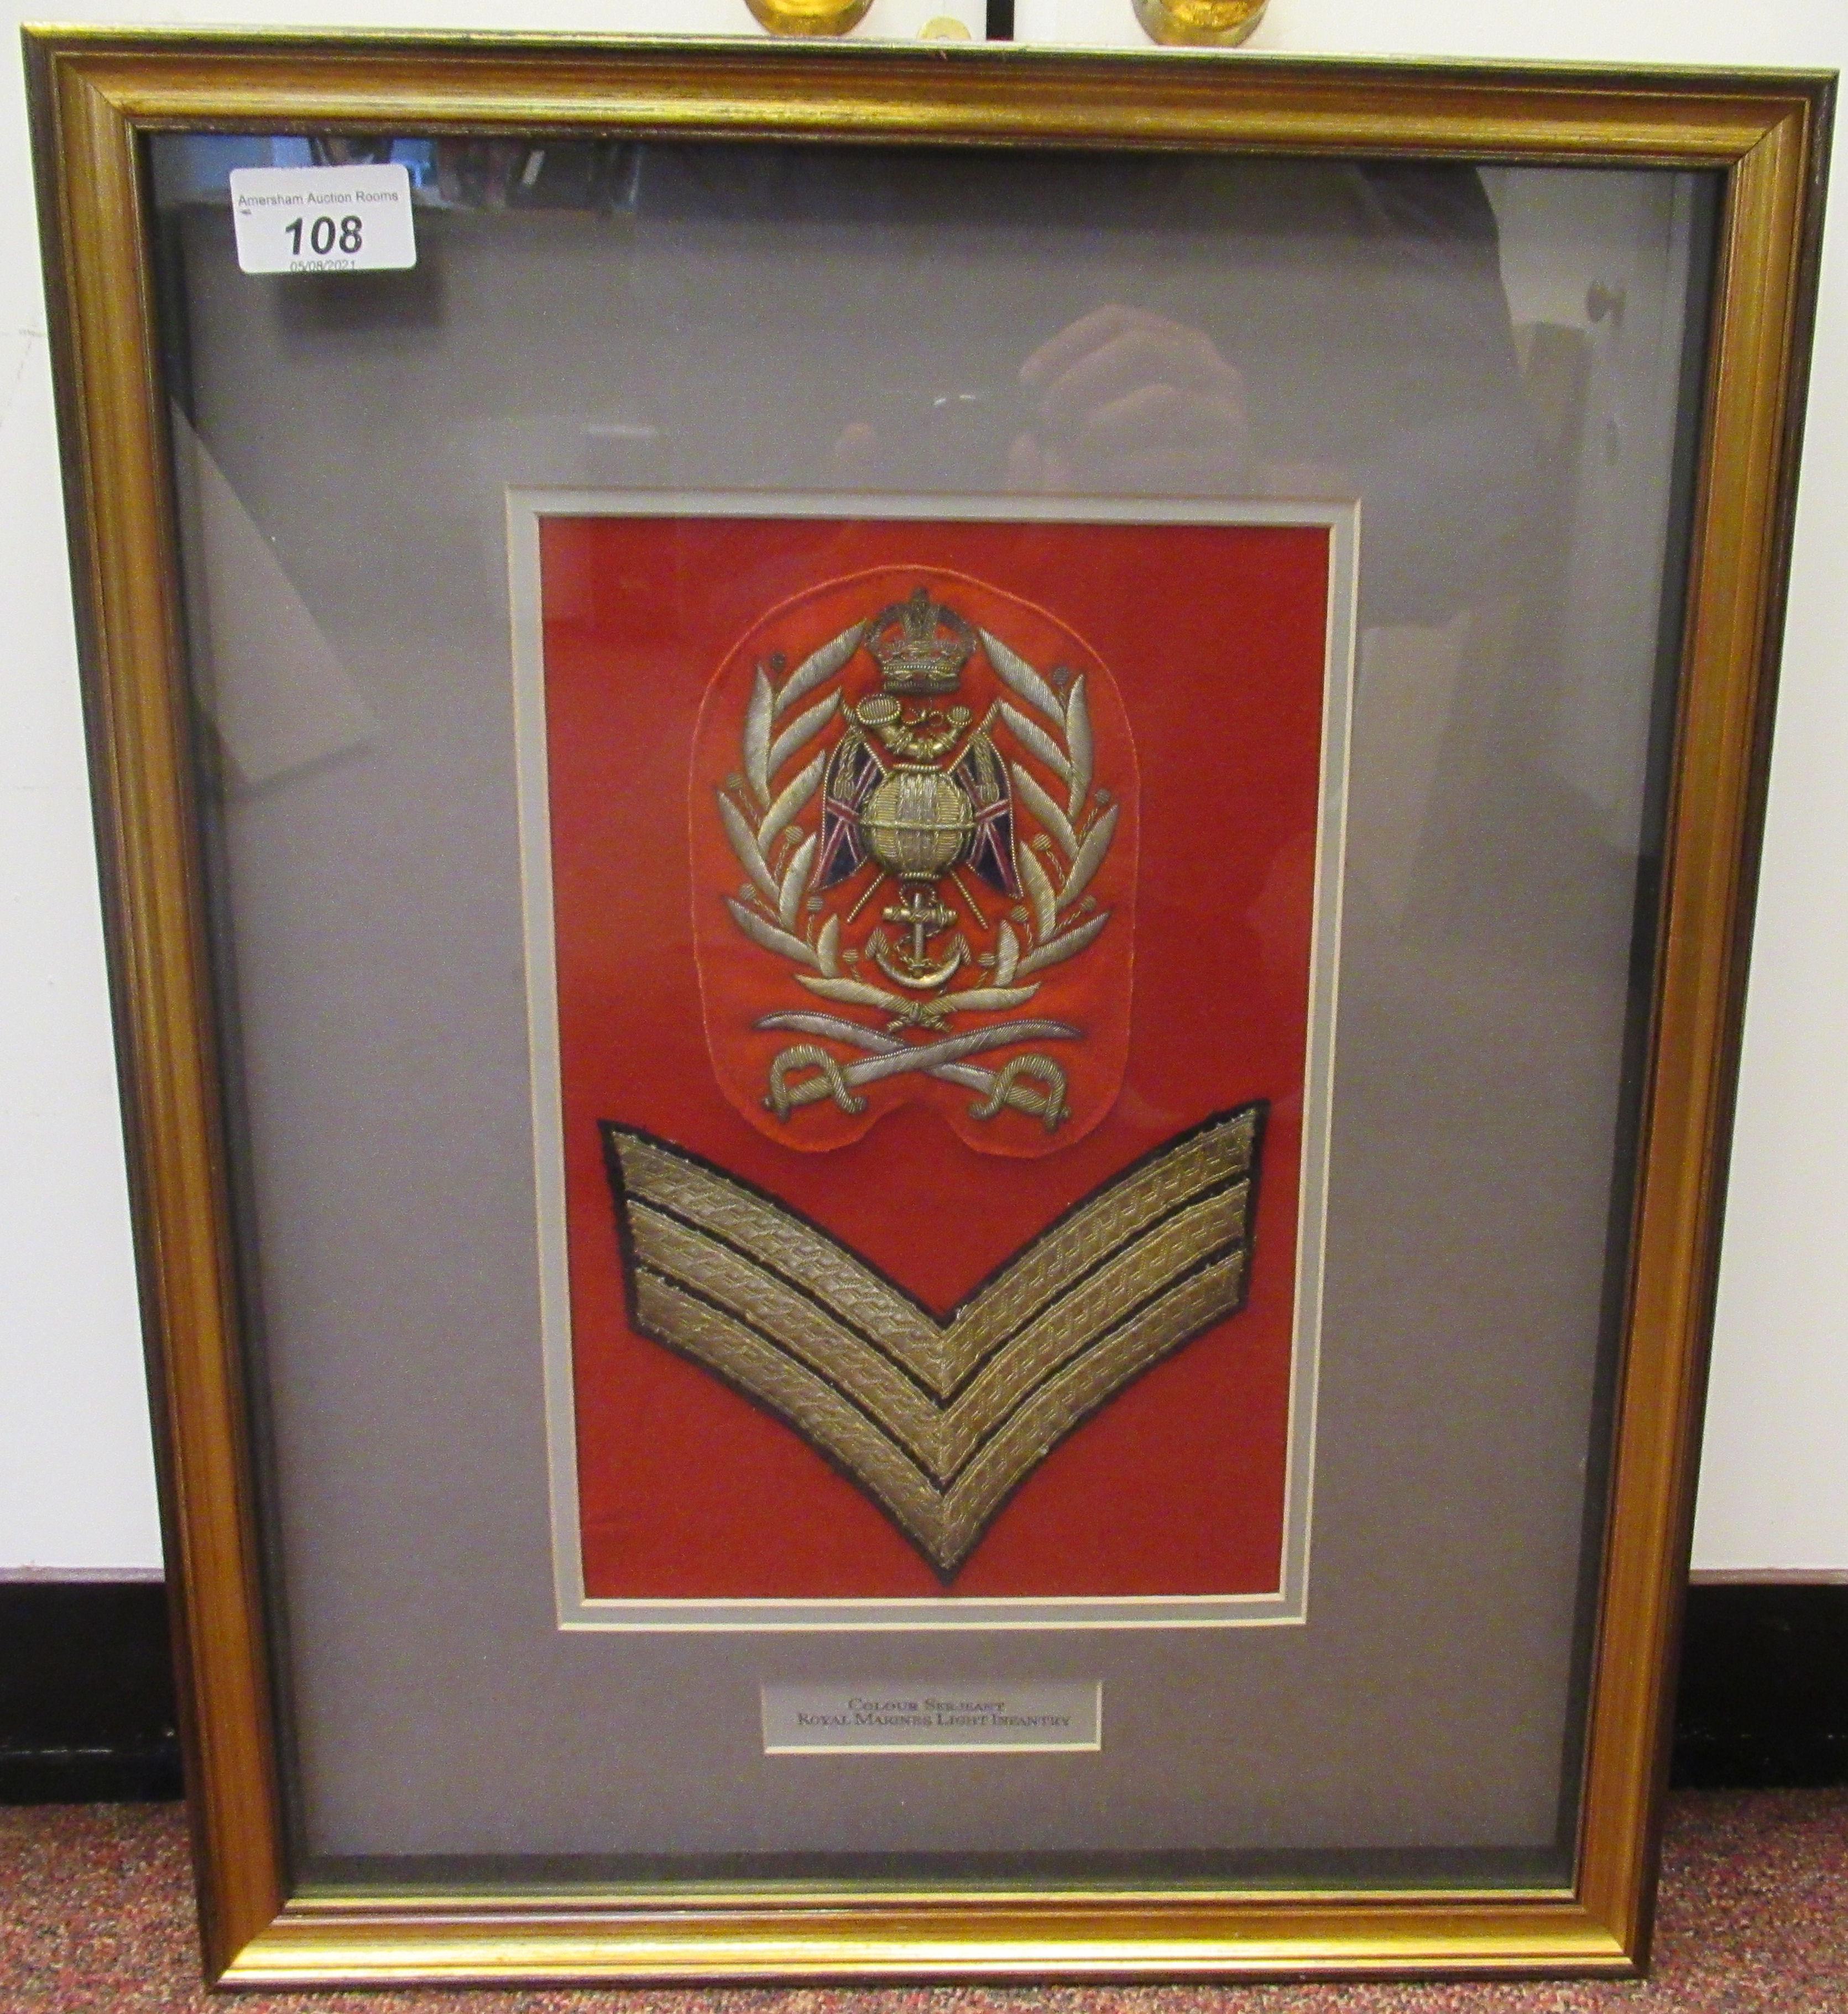 British military braided uniform insignia, viz. Colour Sergeant Royal Marines Light Infantry(